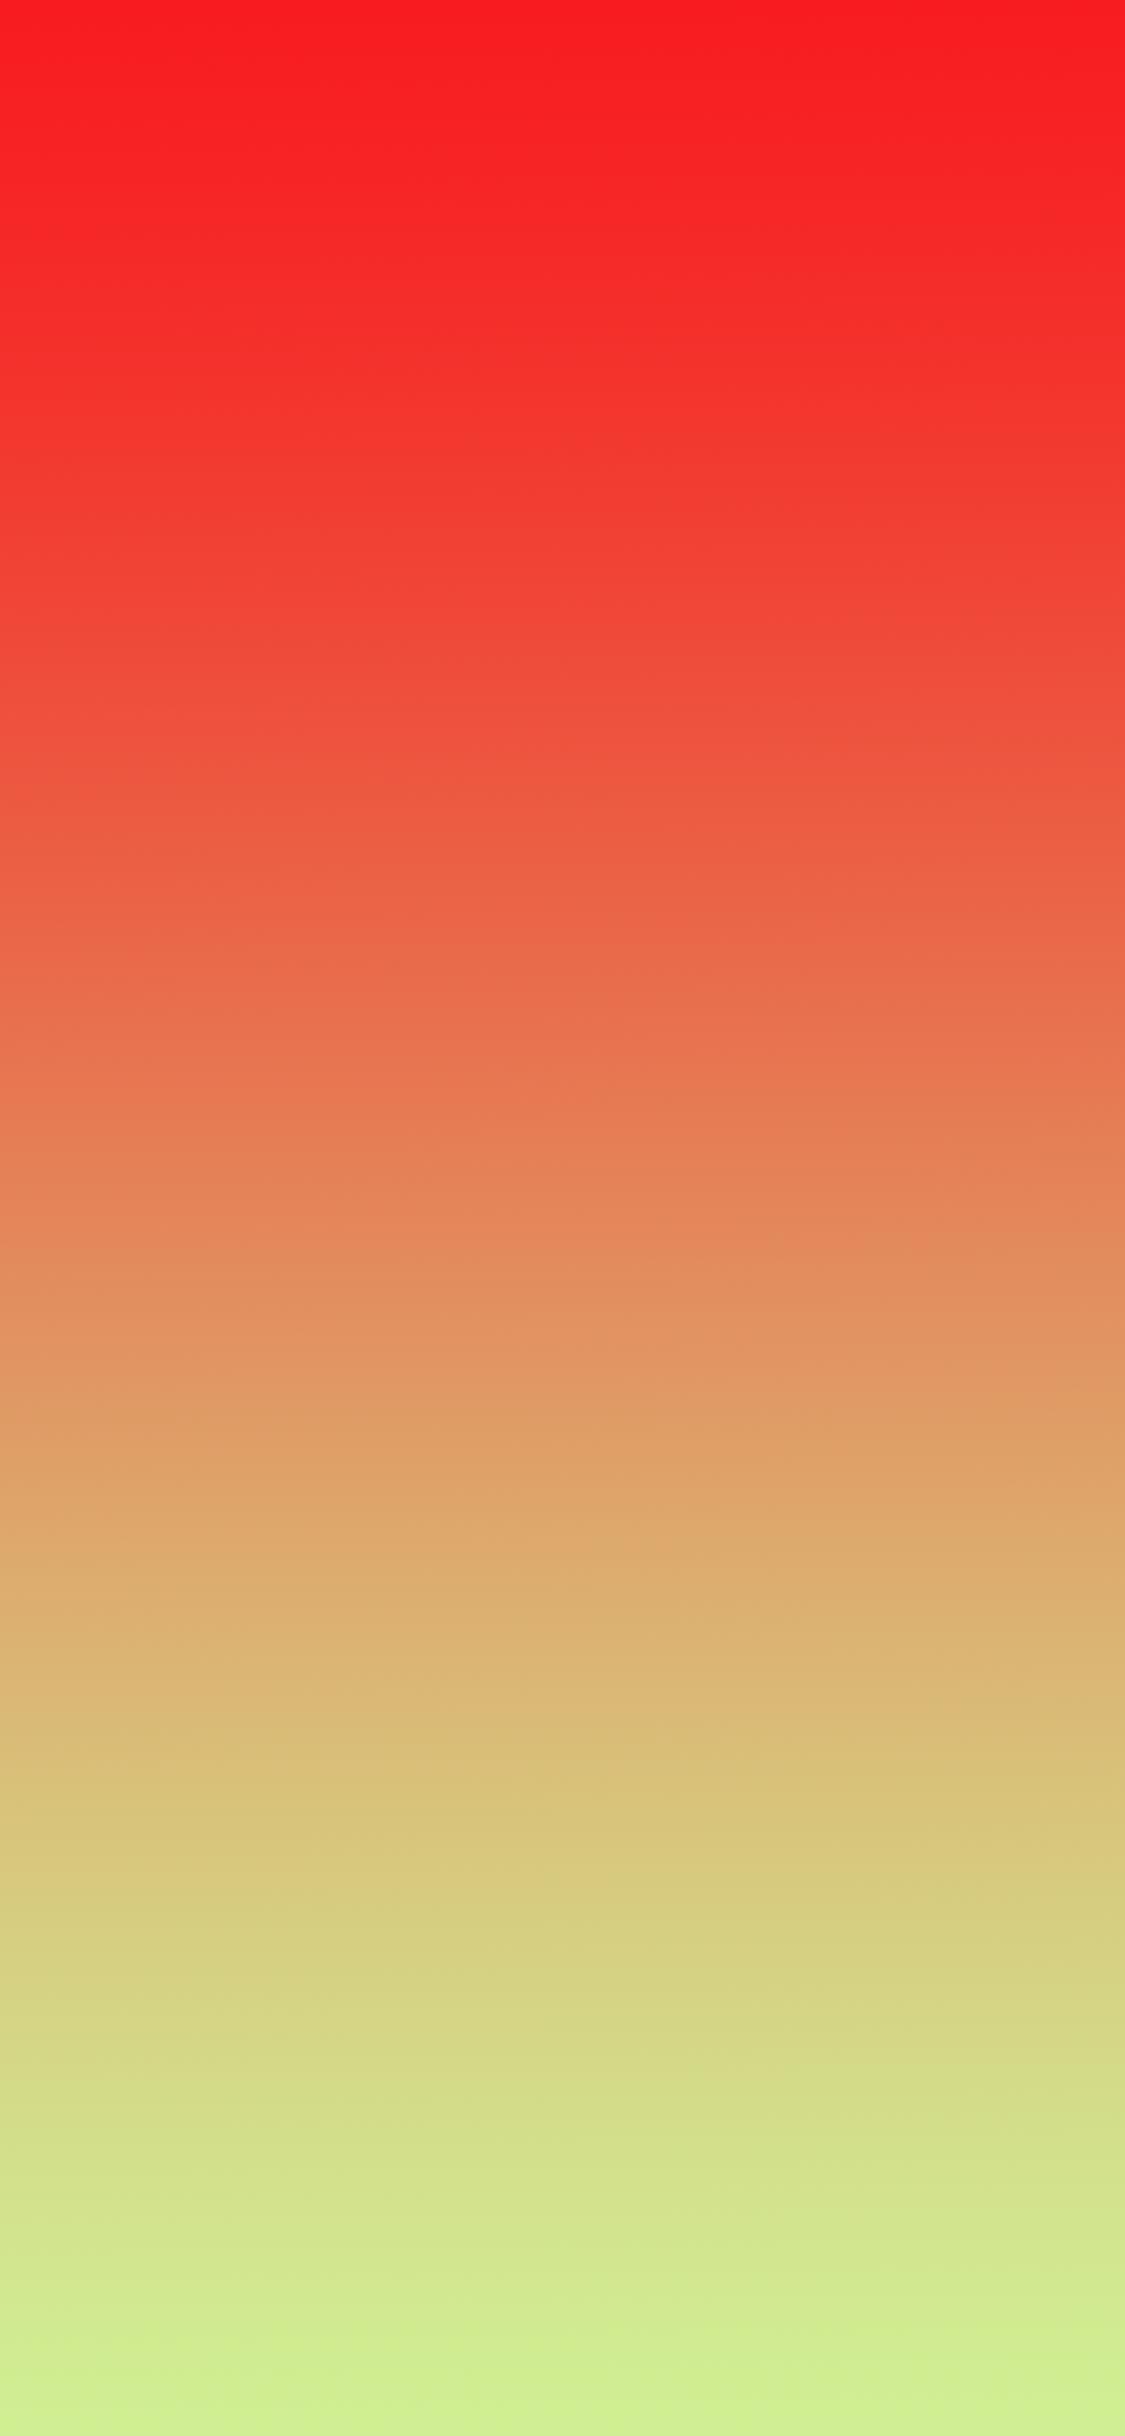 Orange To Yellow Gradient S5 Wallpaper Iphone Wallpaper Iphone 6 Wallpaper